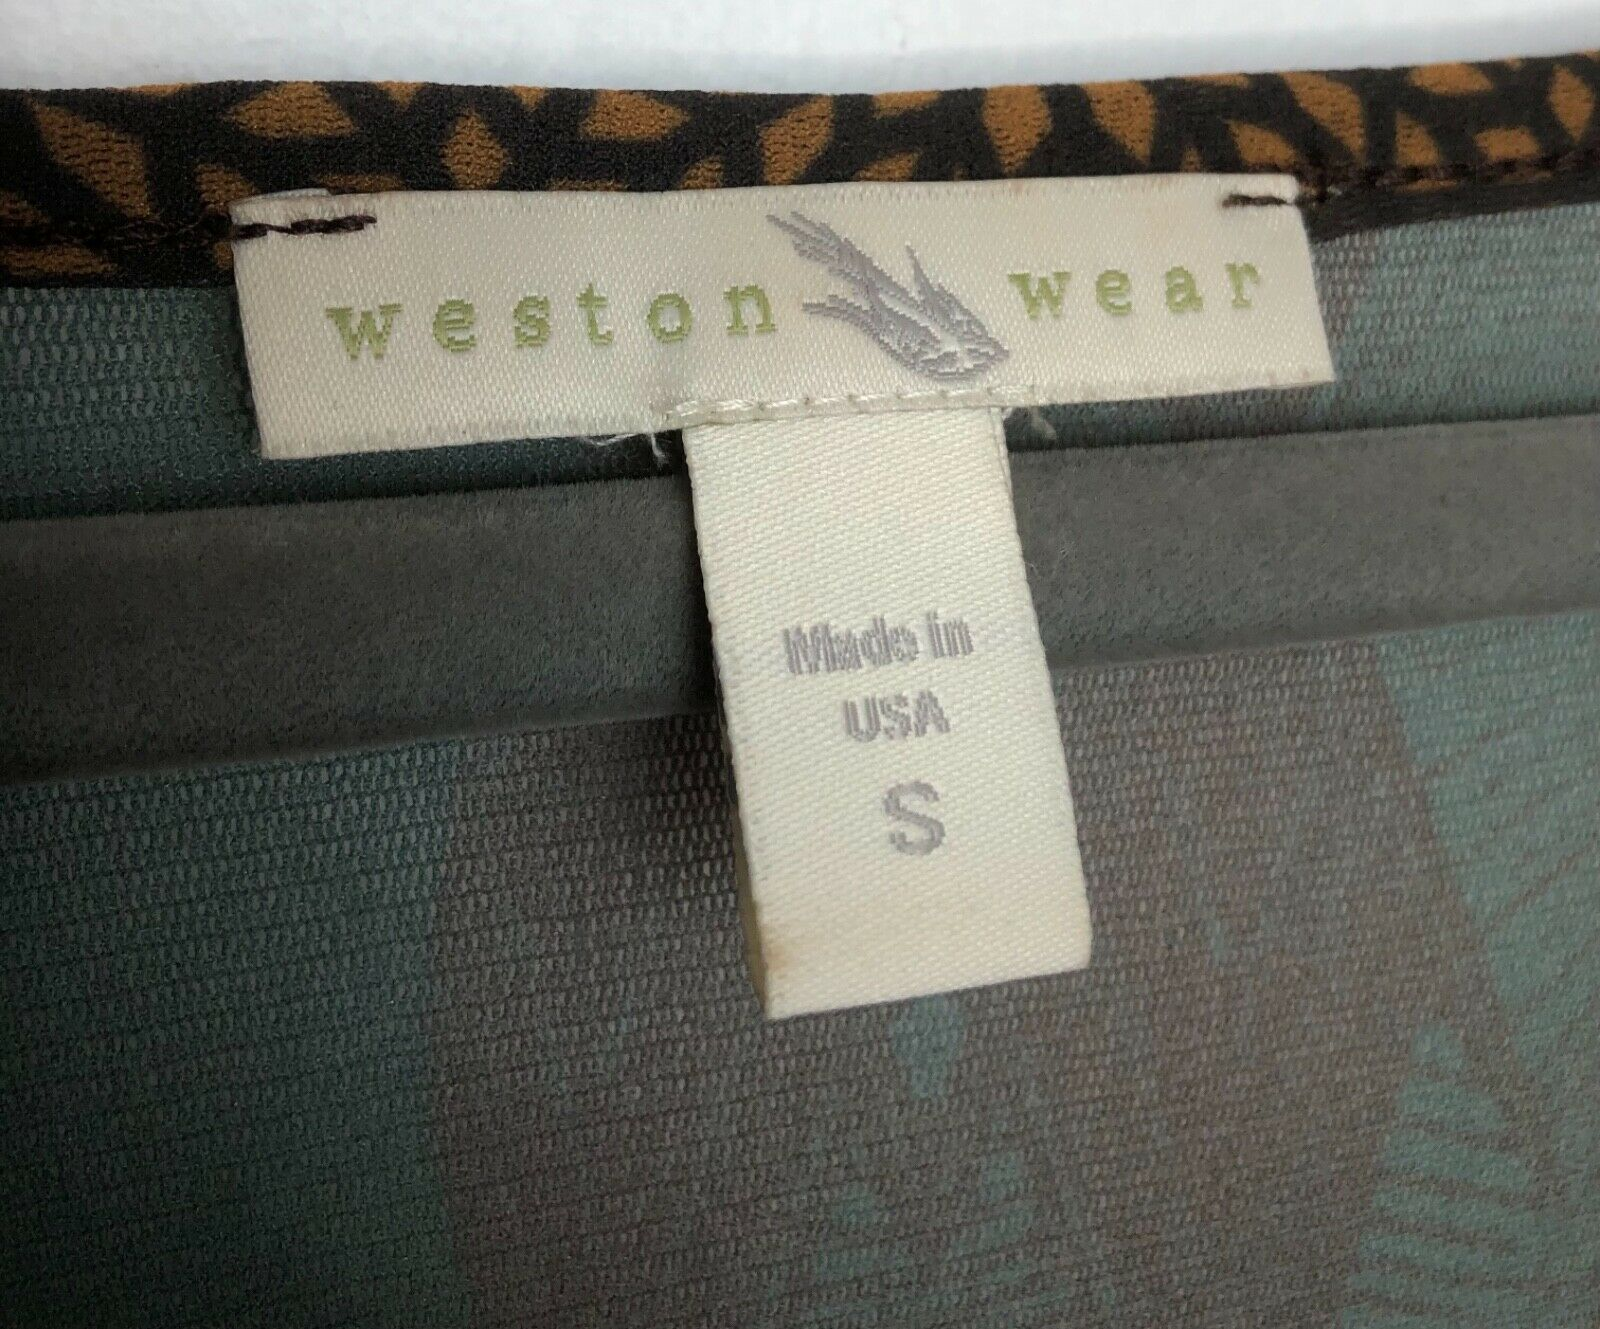 WESTON WEAR Womens Size Small Nylon Shirt Sheer M… - image 4